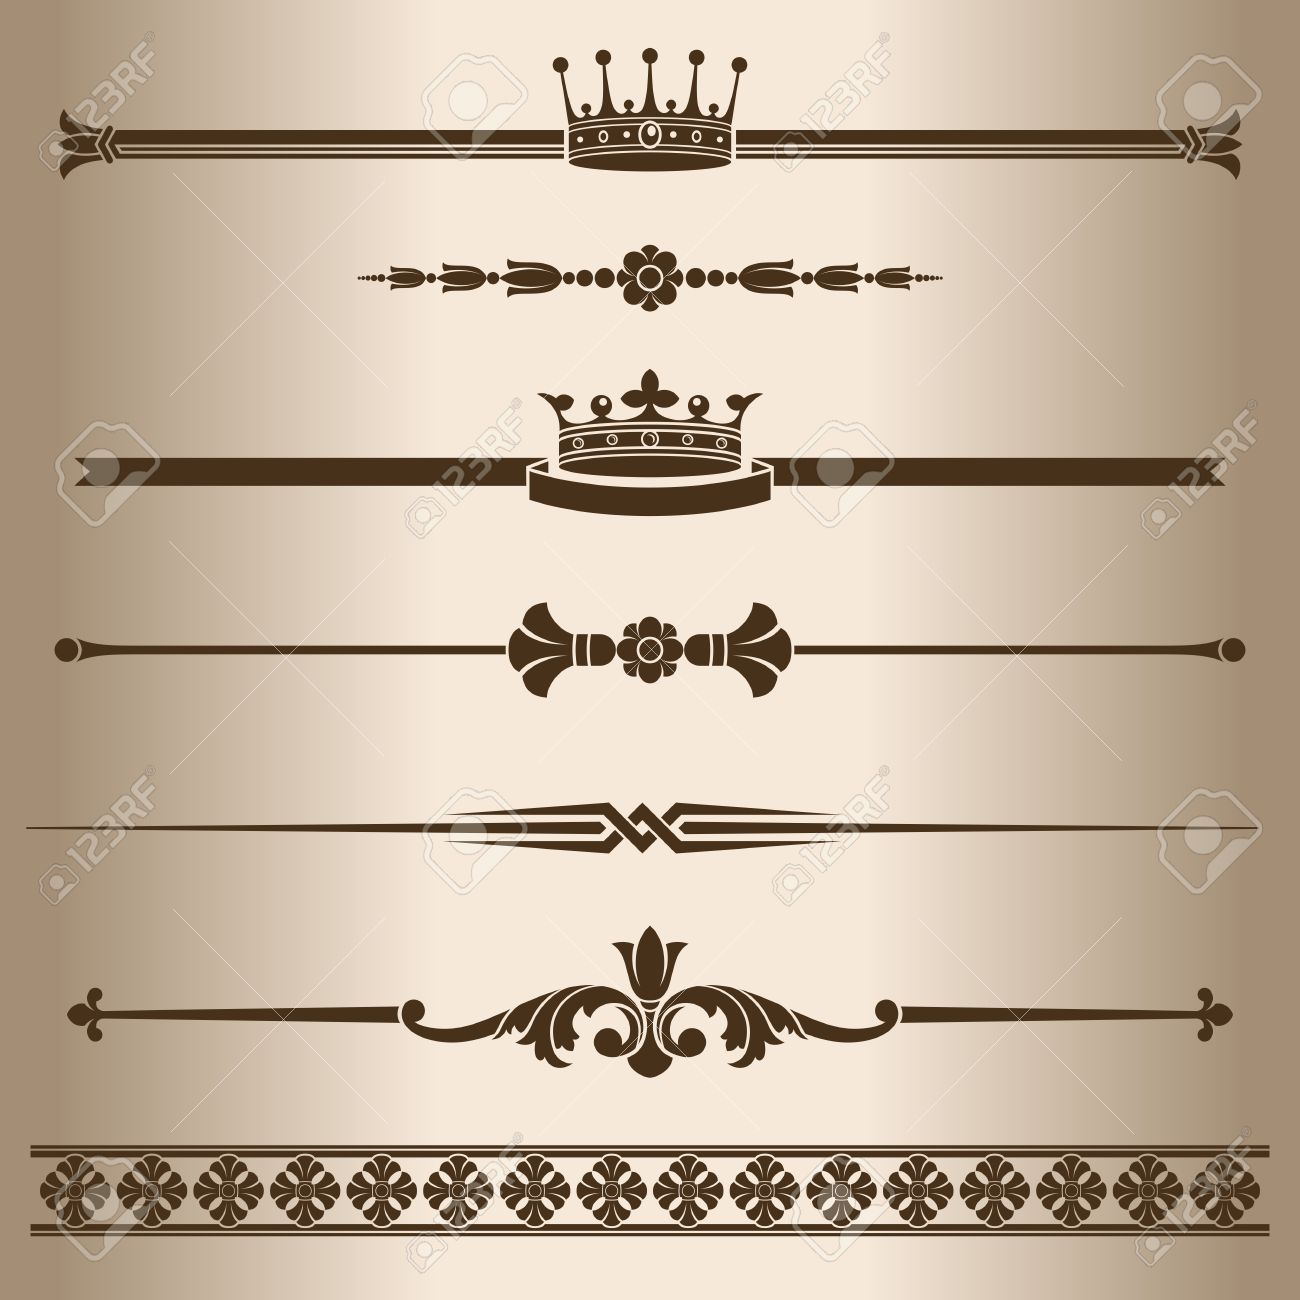 Decorative lines elements for design decorative line dividers decorative lines elements for design decorative line dividers vector illustration stock vector altavistaventures Choice Image